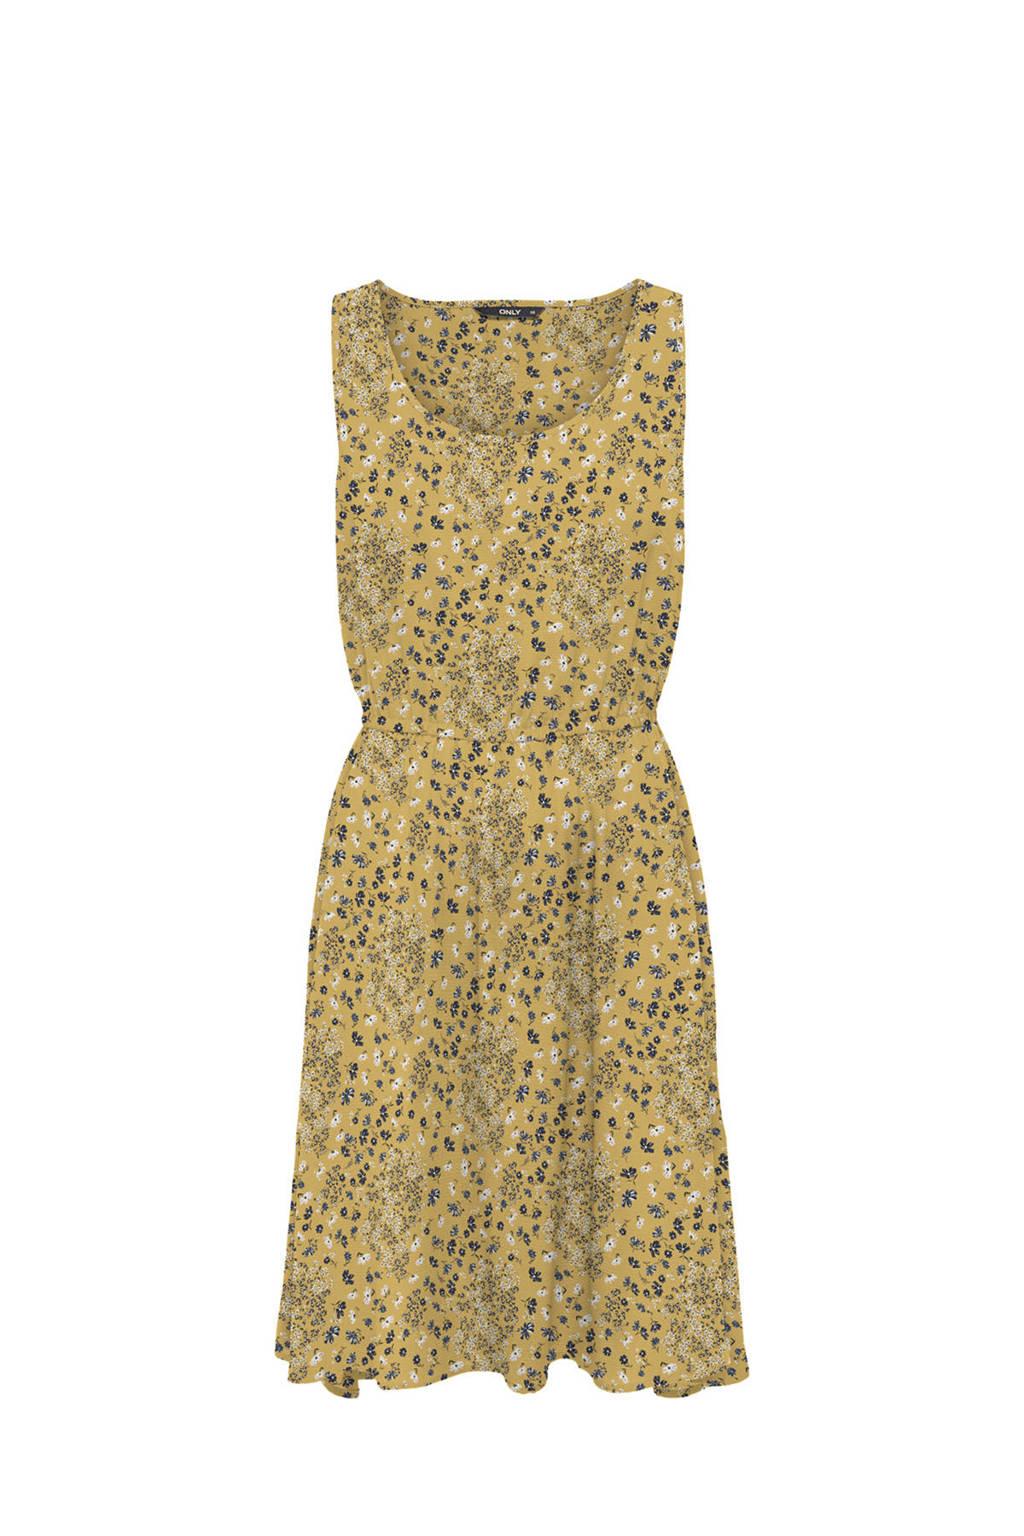 ONLY jurk met all over print geel, Geel